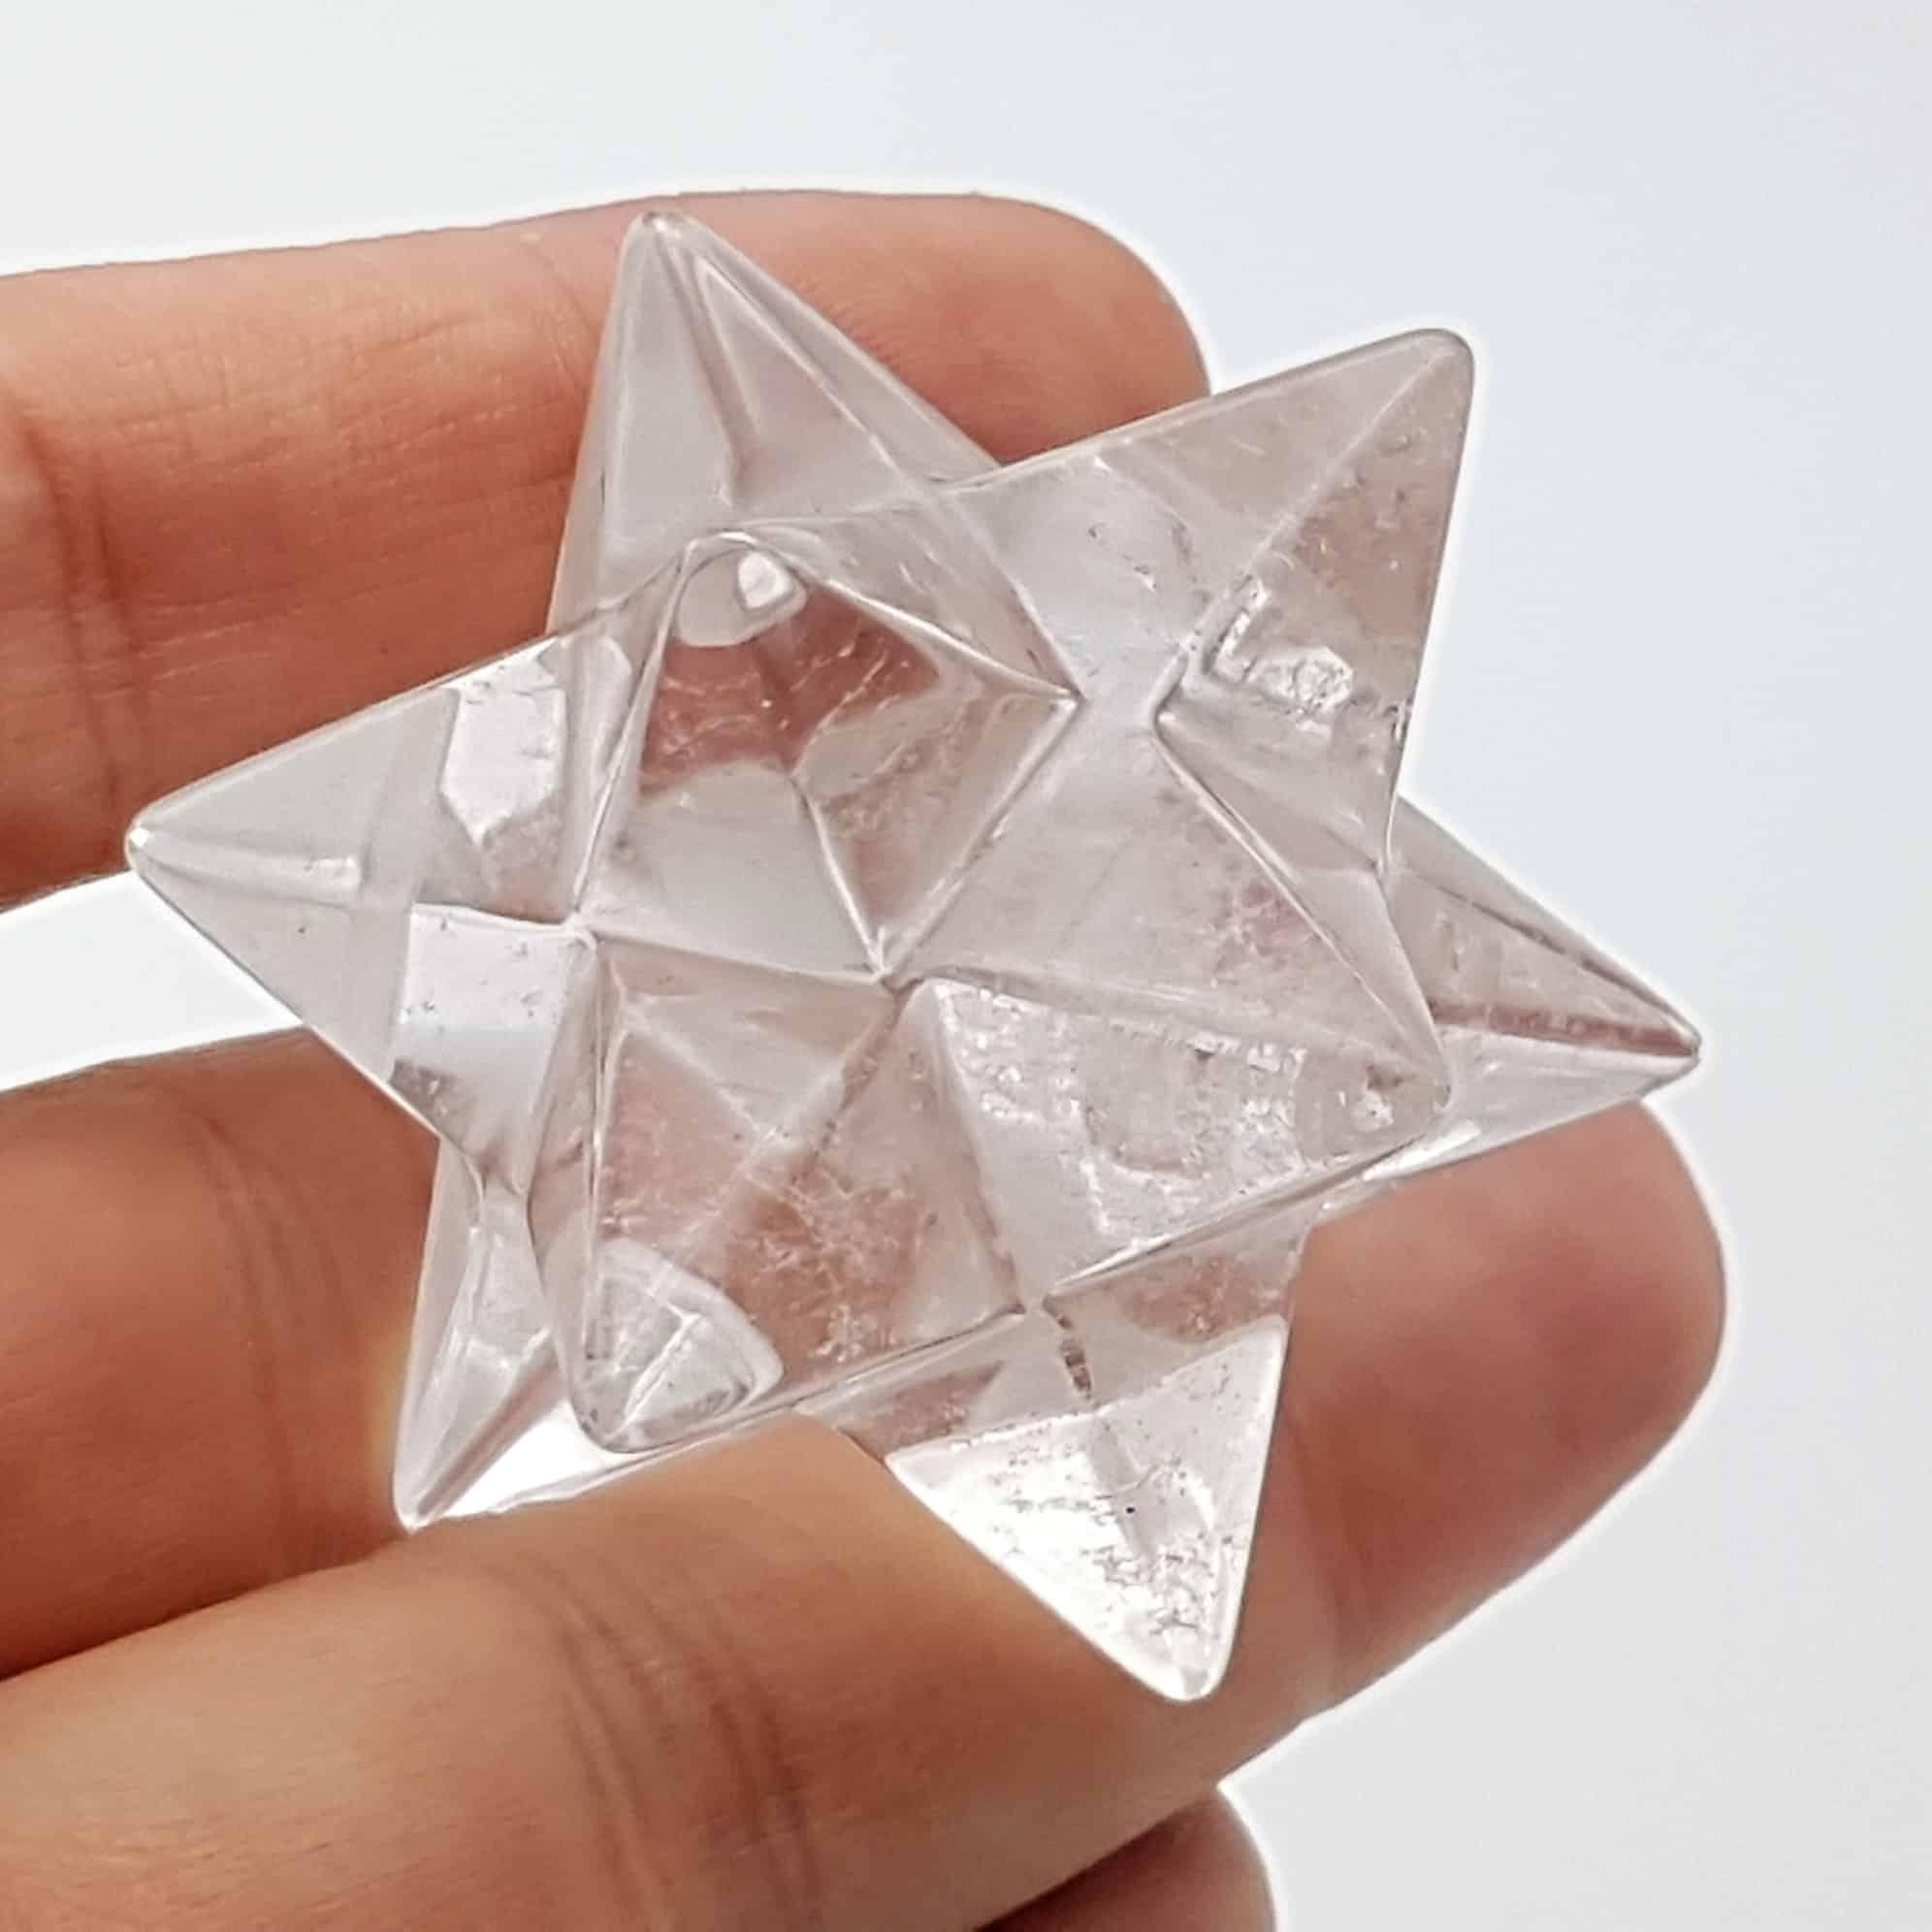 Estrella doble merkaba de cuarzo cristal de roca (1)